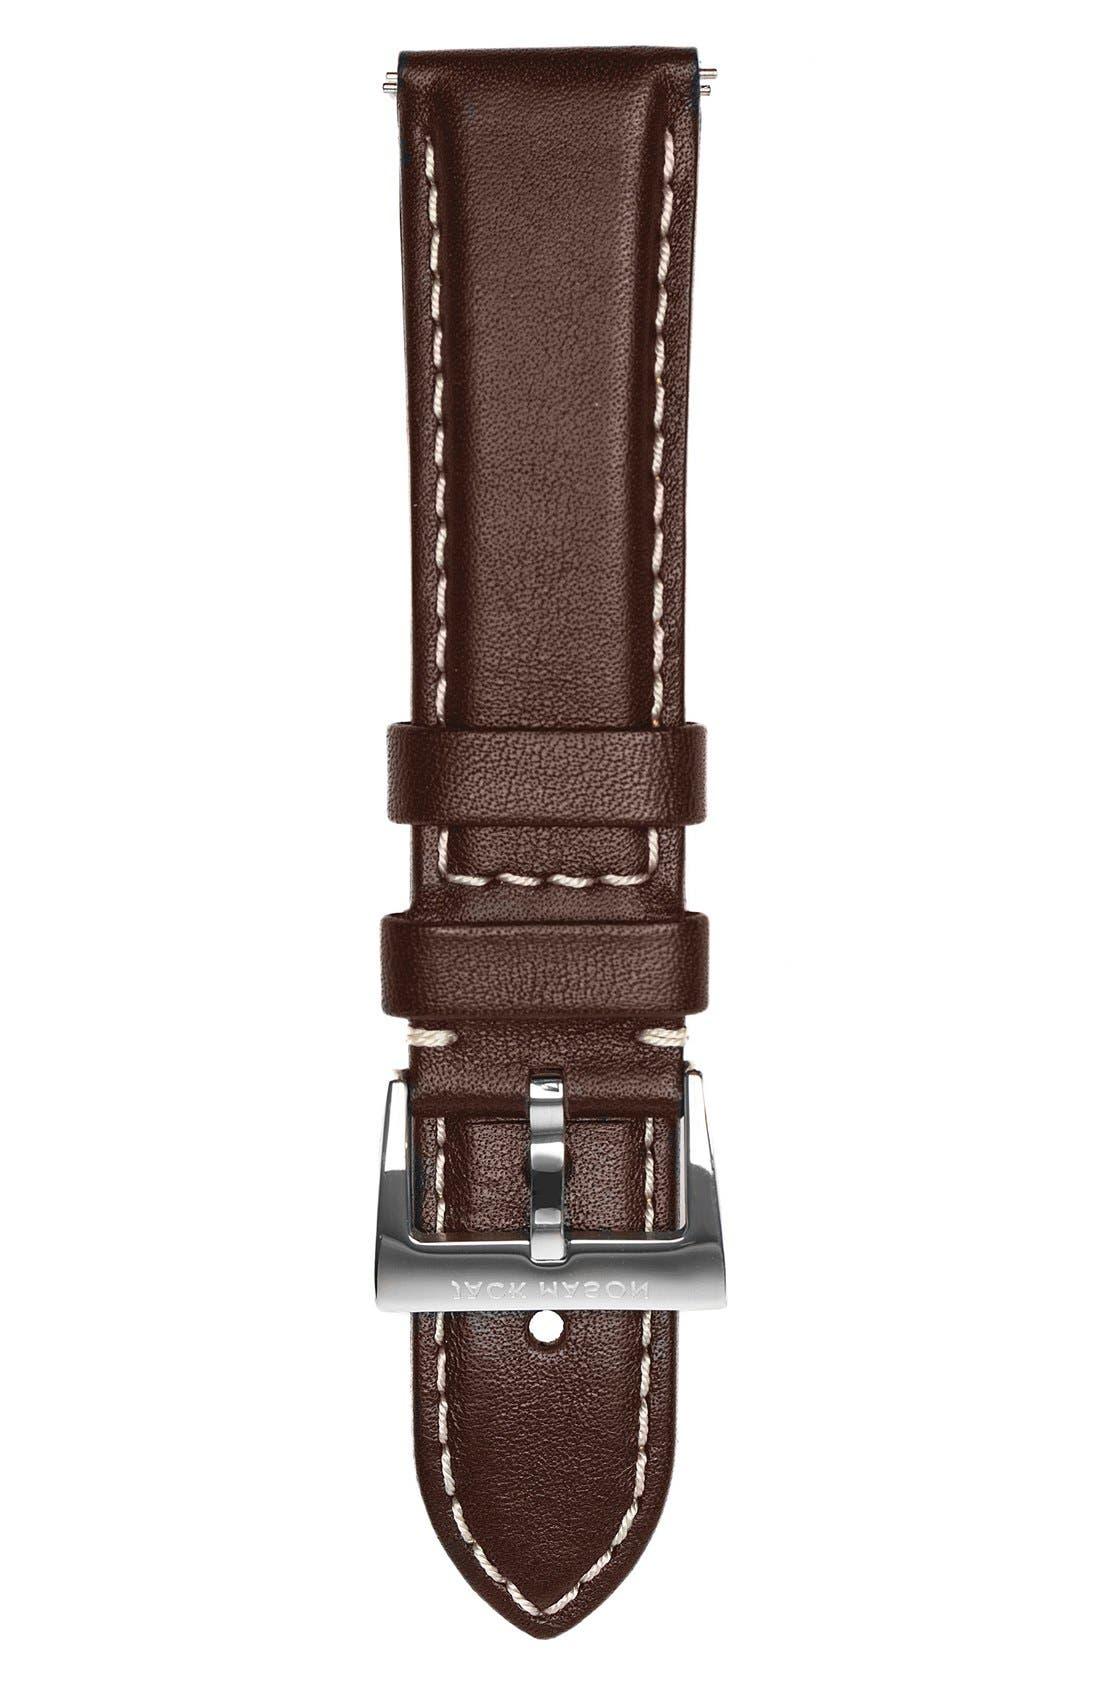 Main Image - Jack Mason Leather Watch Strap, 22mm